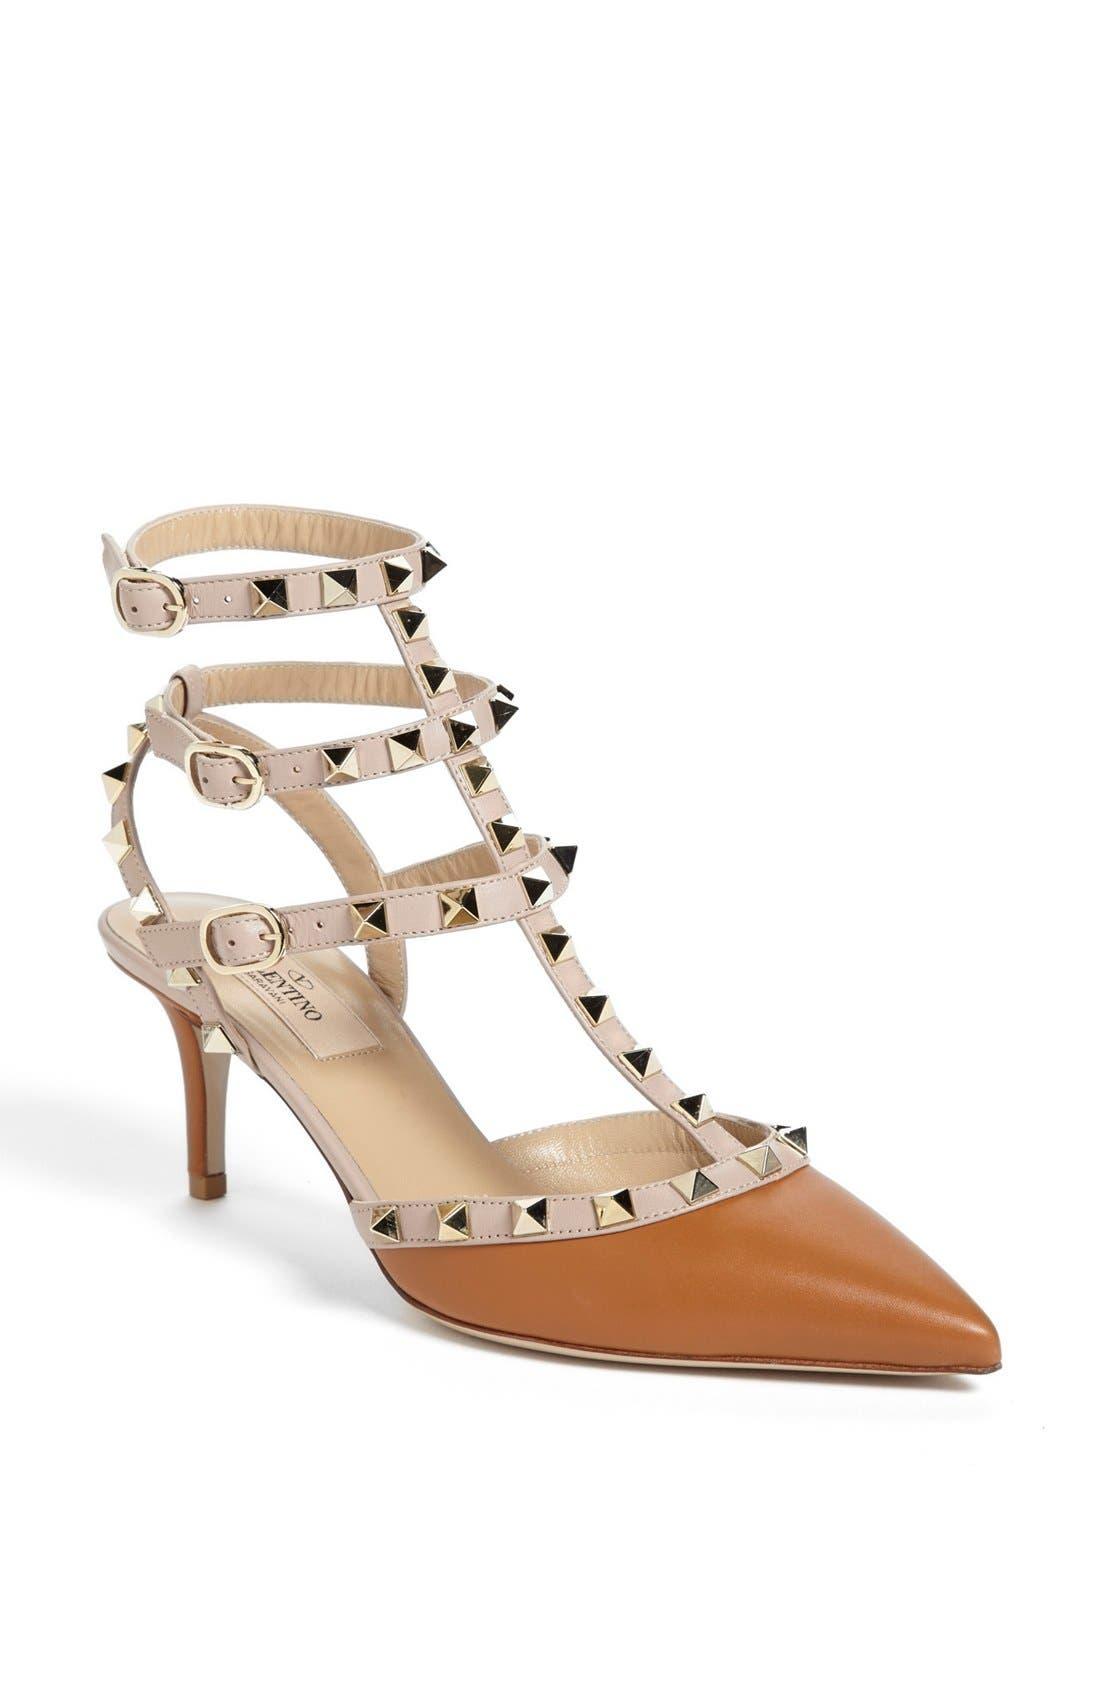 Main Image - Valentino 'Rockstud' Triple Ankle Strap Pump